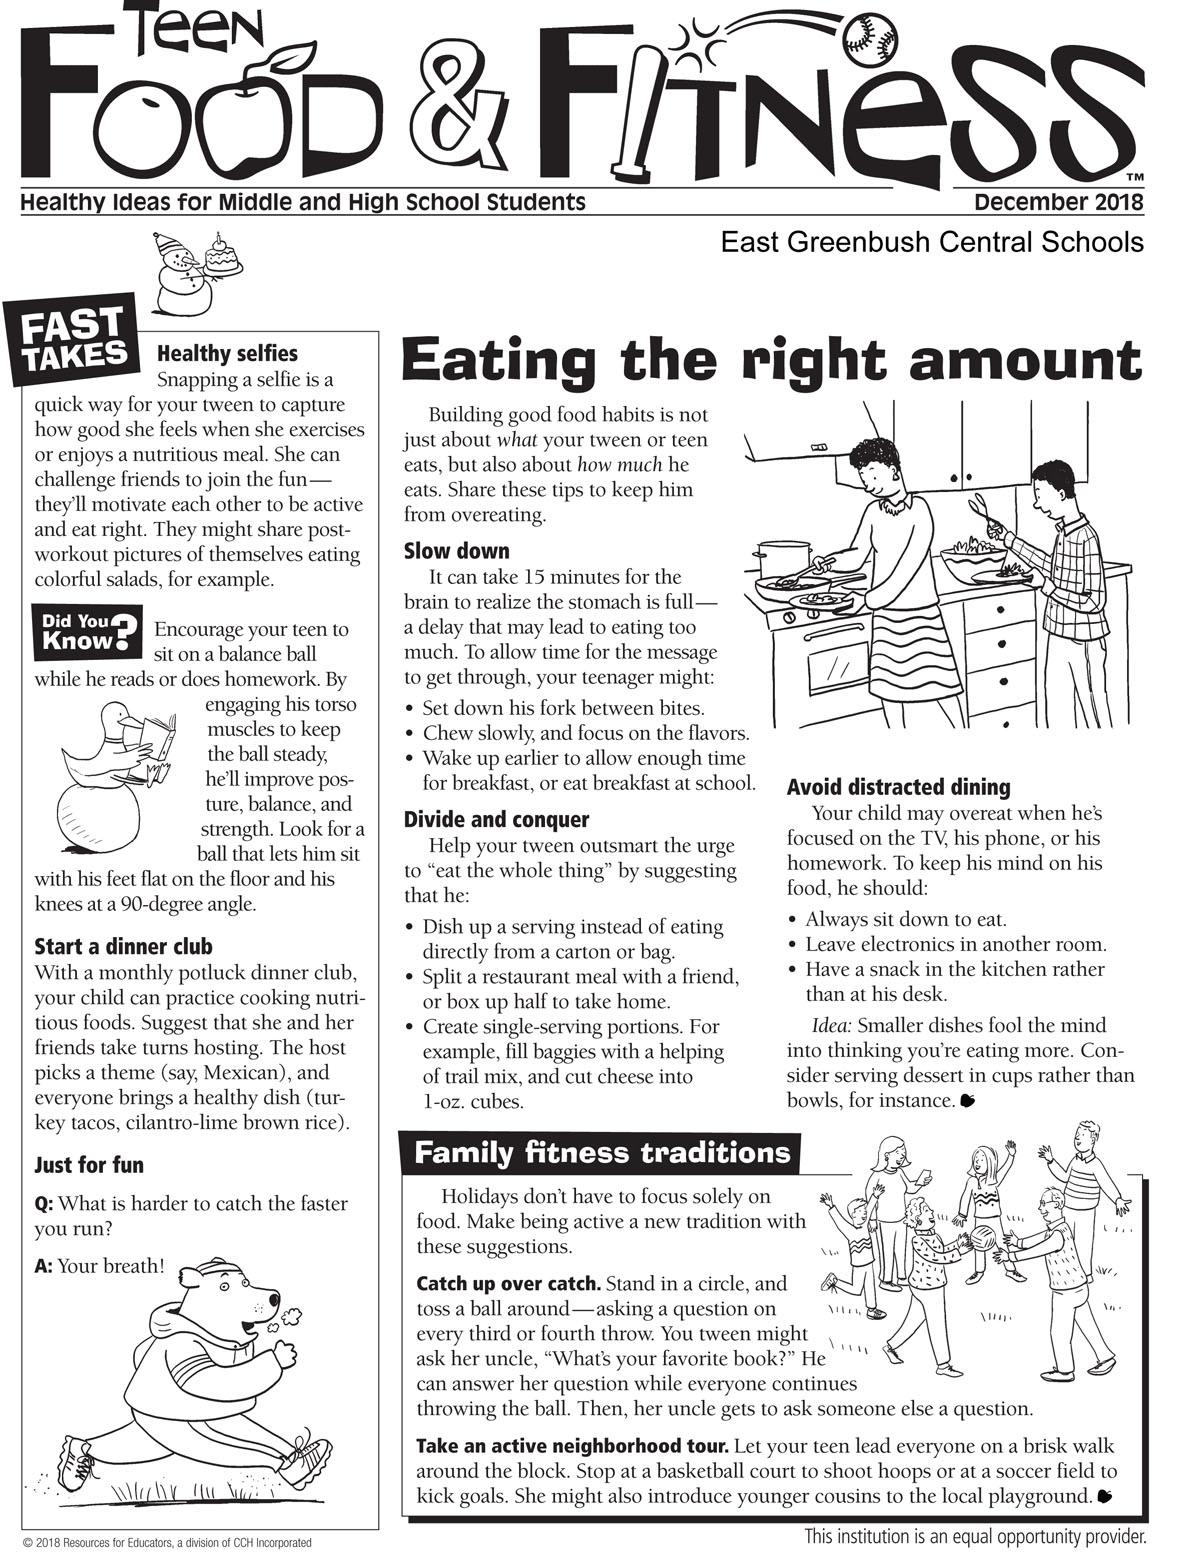 Food & Fitness newsletter December issue